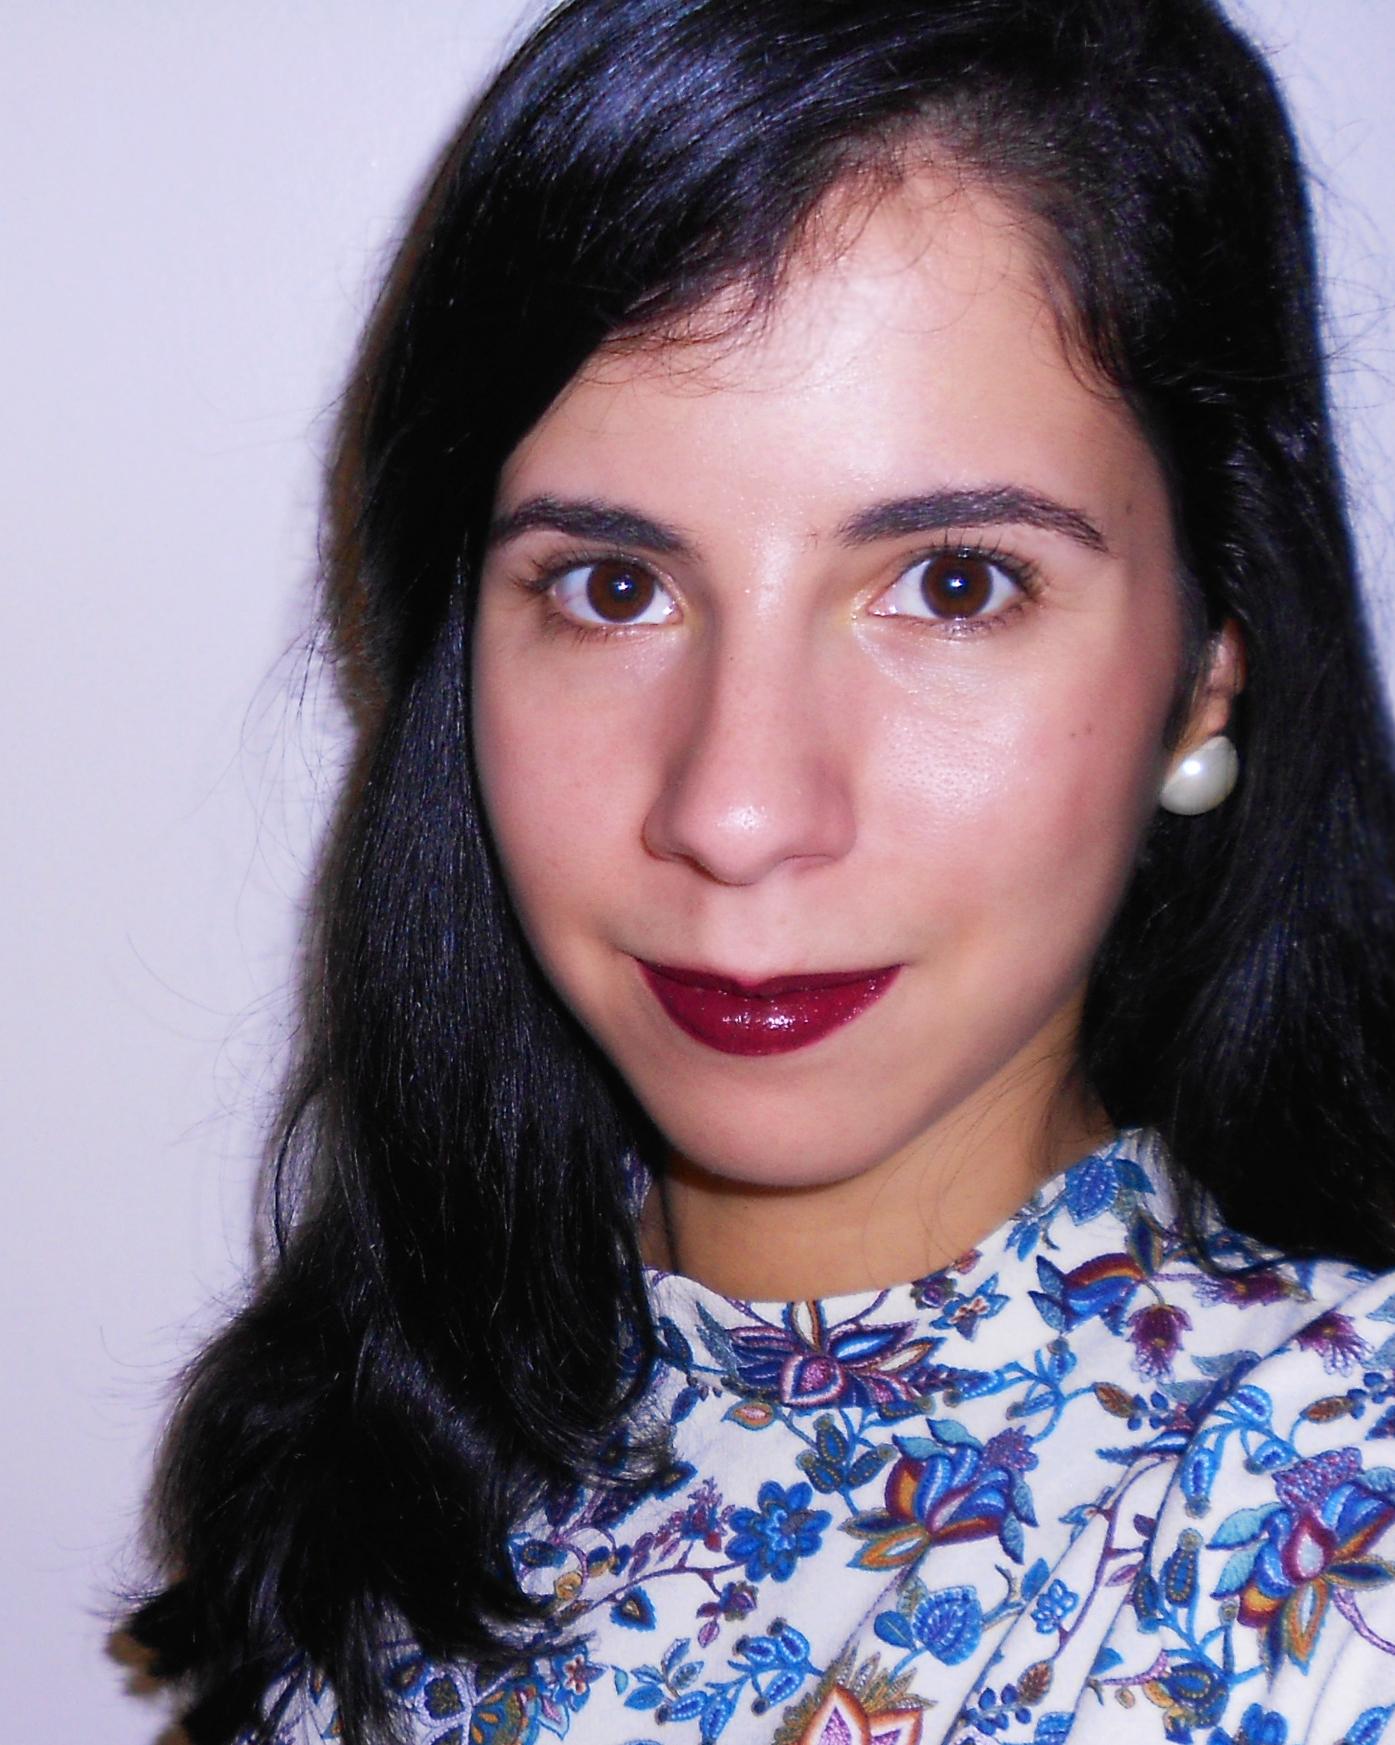 batom avon vixen review swatch resenha opinião make up maquilhagem blog beleza beauty burgundy